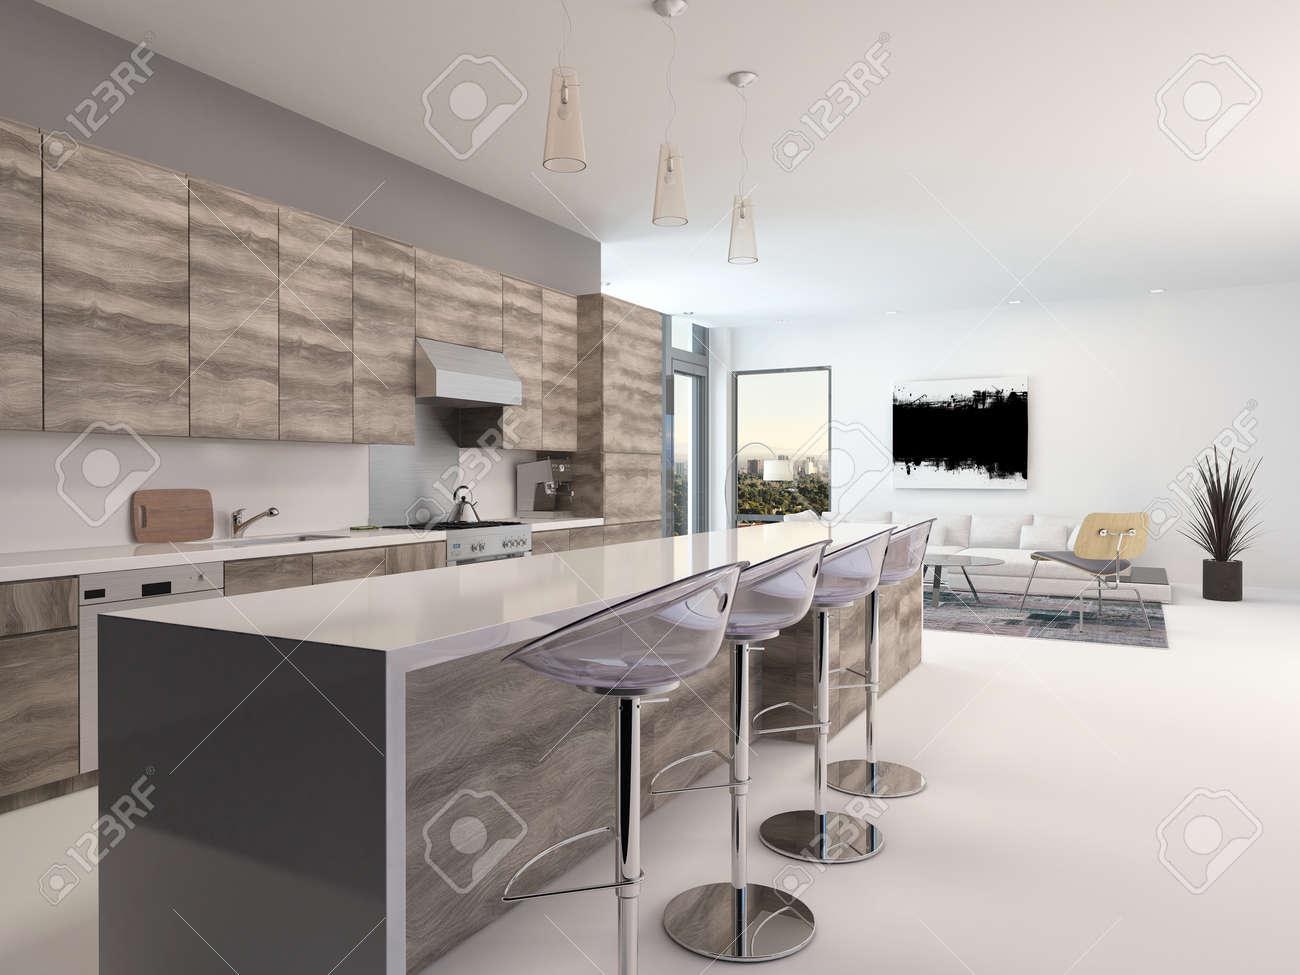 Cucina Americana Design | Arredamento Cucine Americane Simple With ...